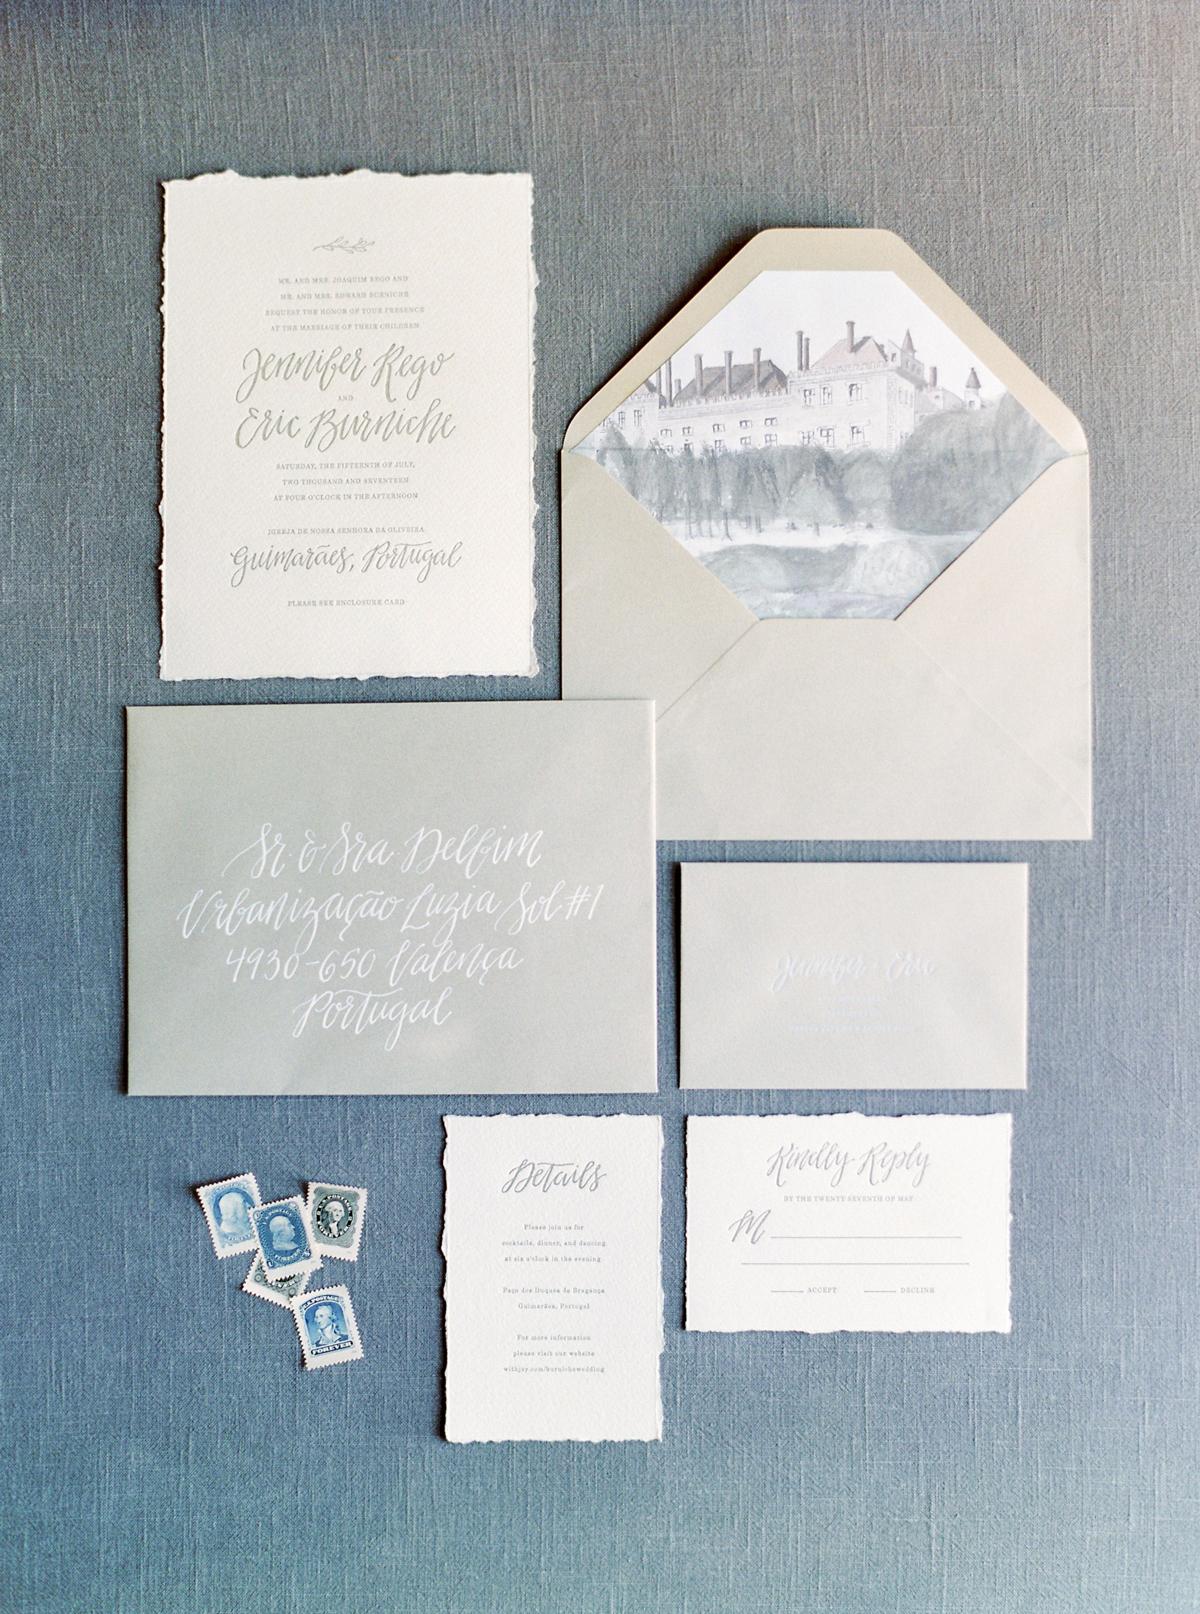 envelope invites andre teixeira brancoprata